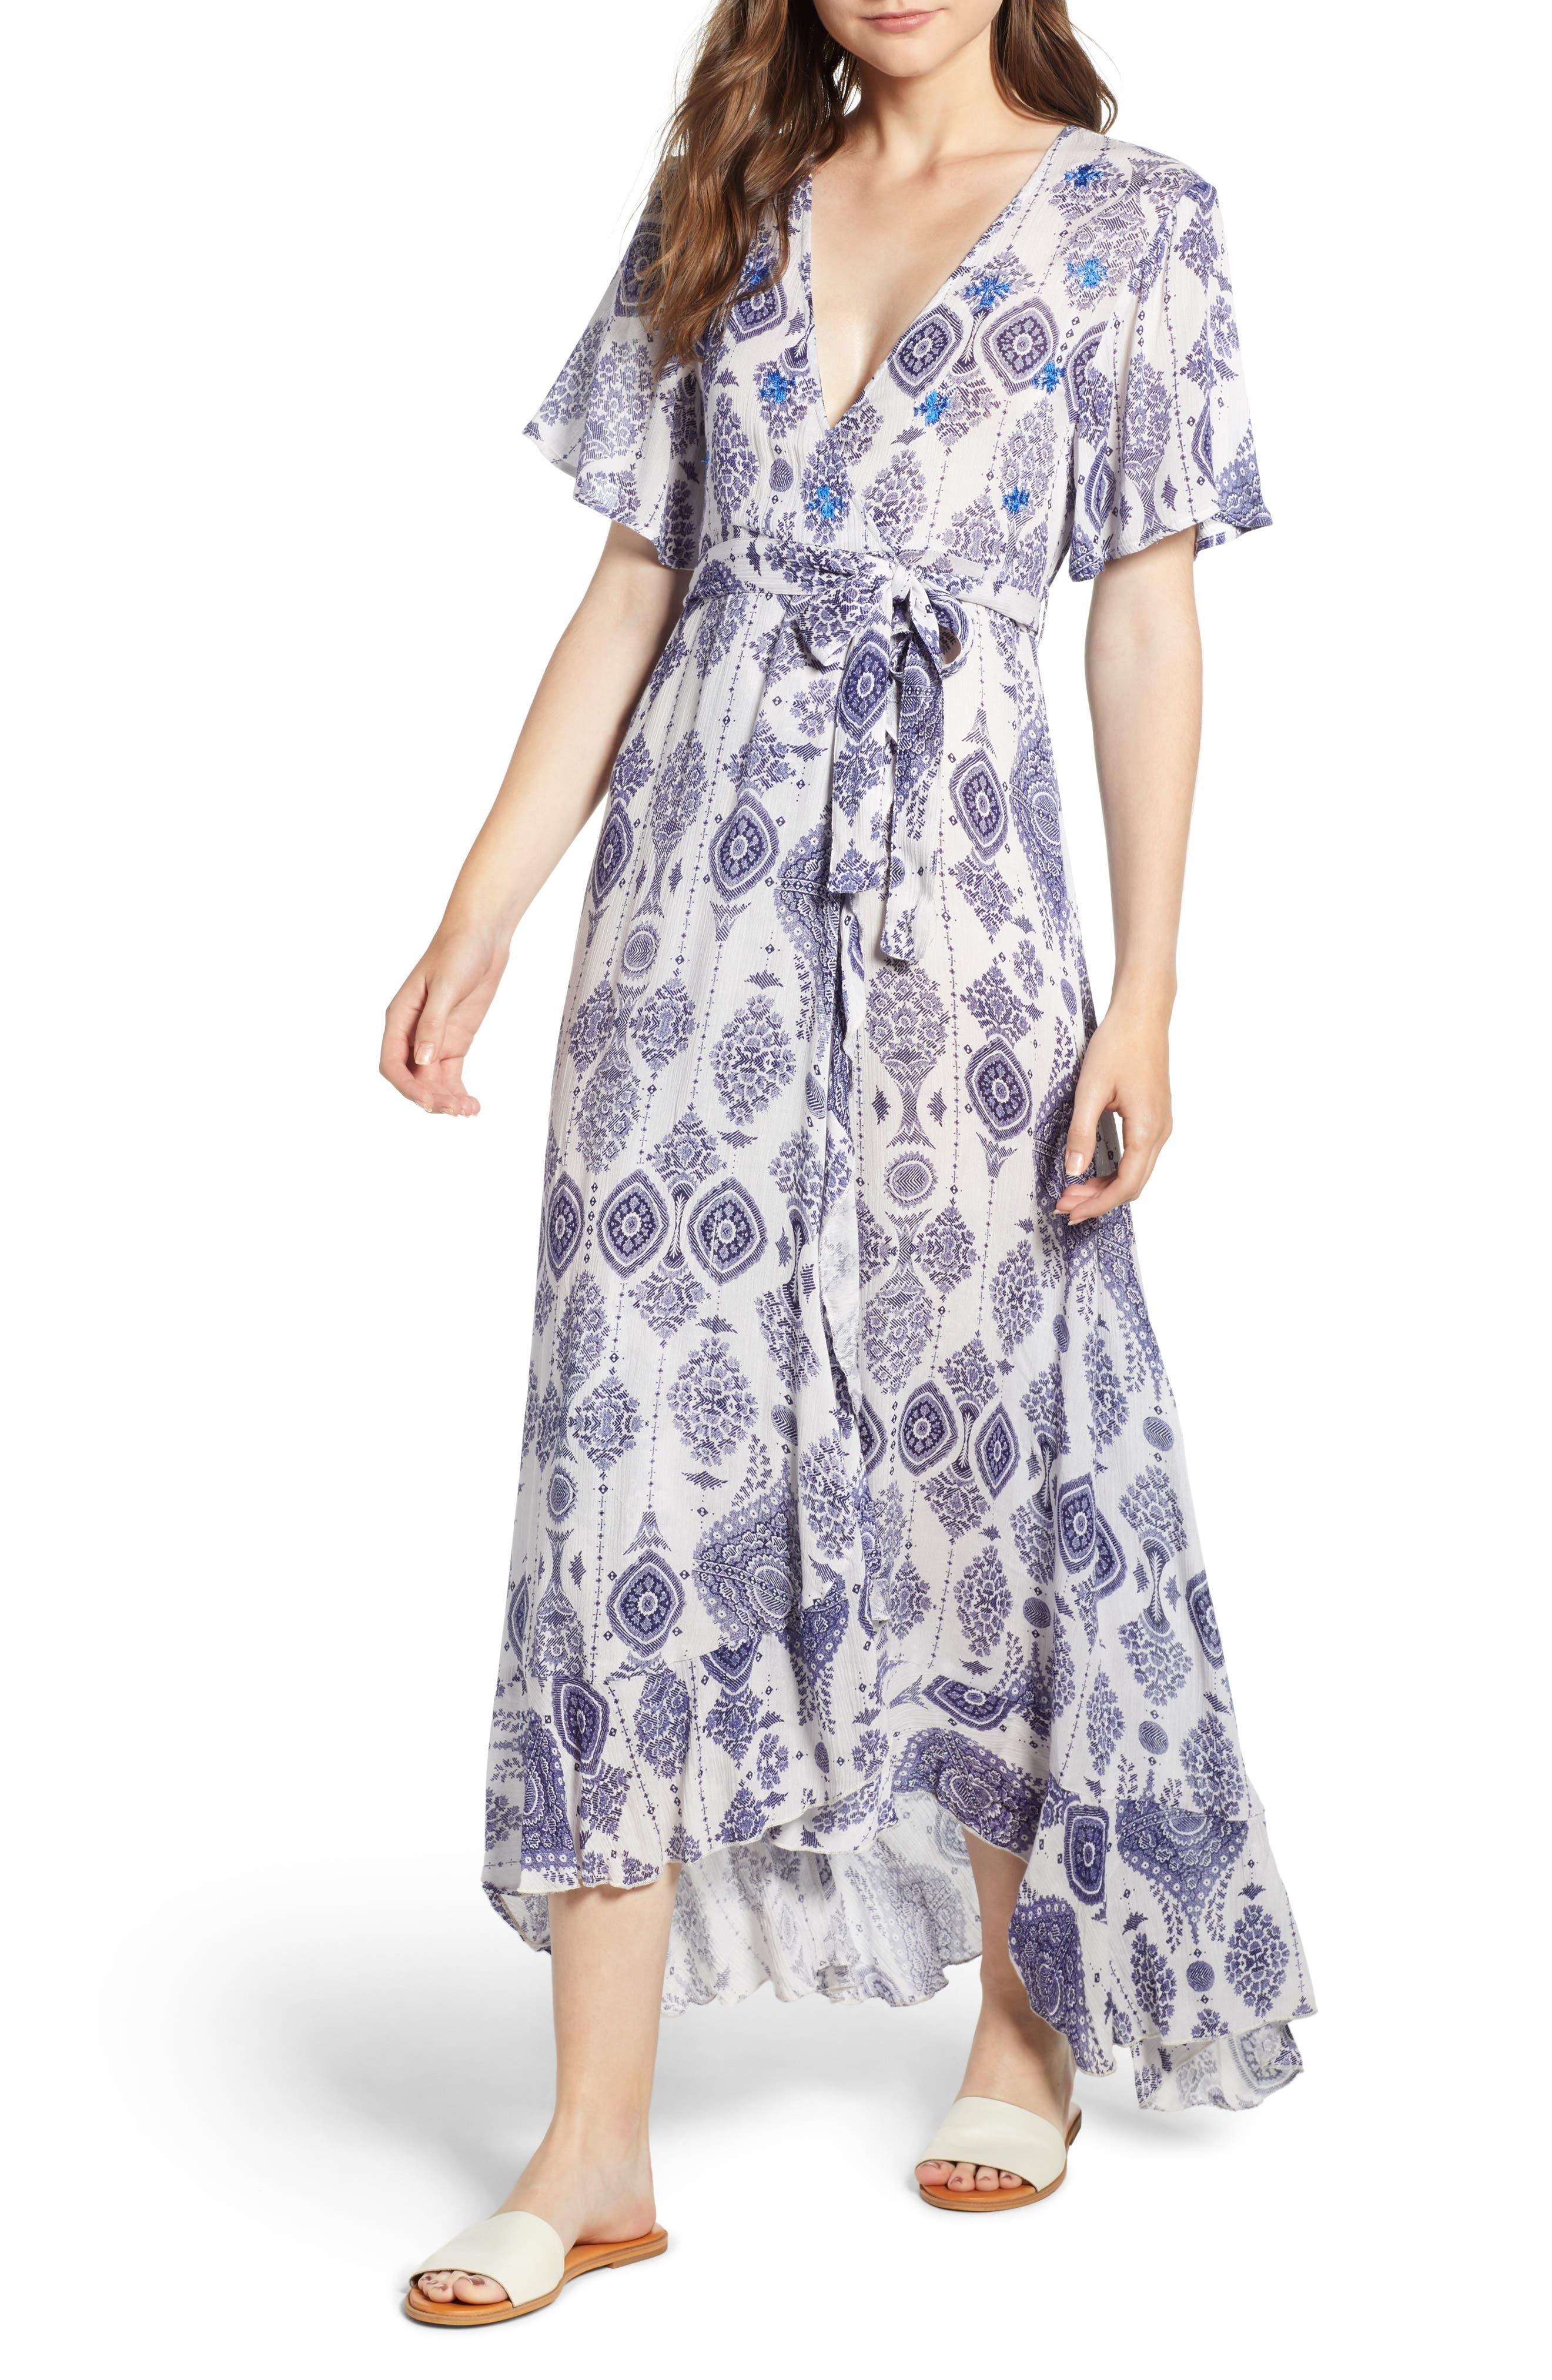 Andrea Maxi Dress,                             Main thumbnail 1, color,                             Blue/ White